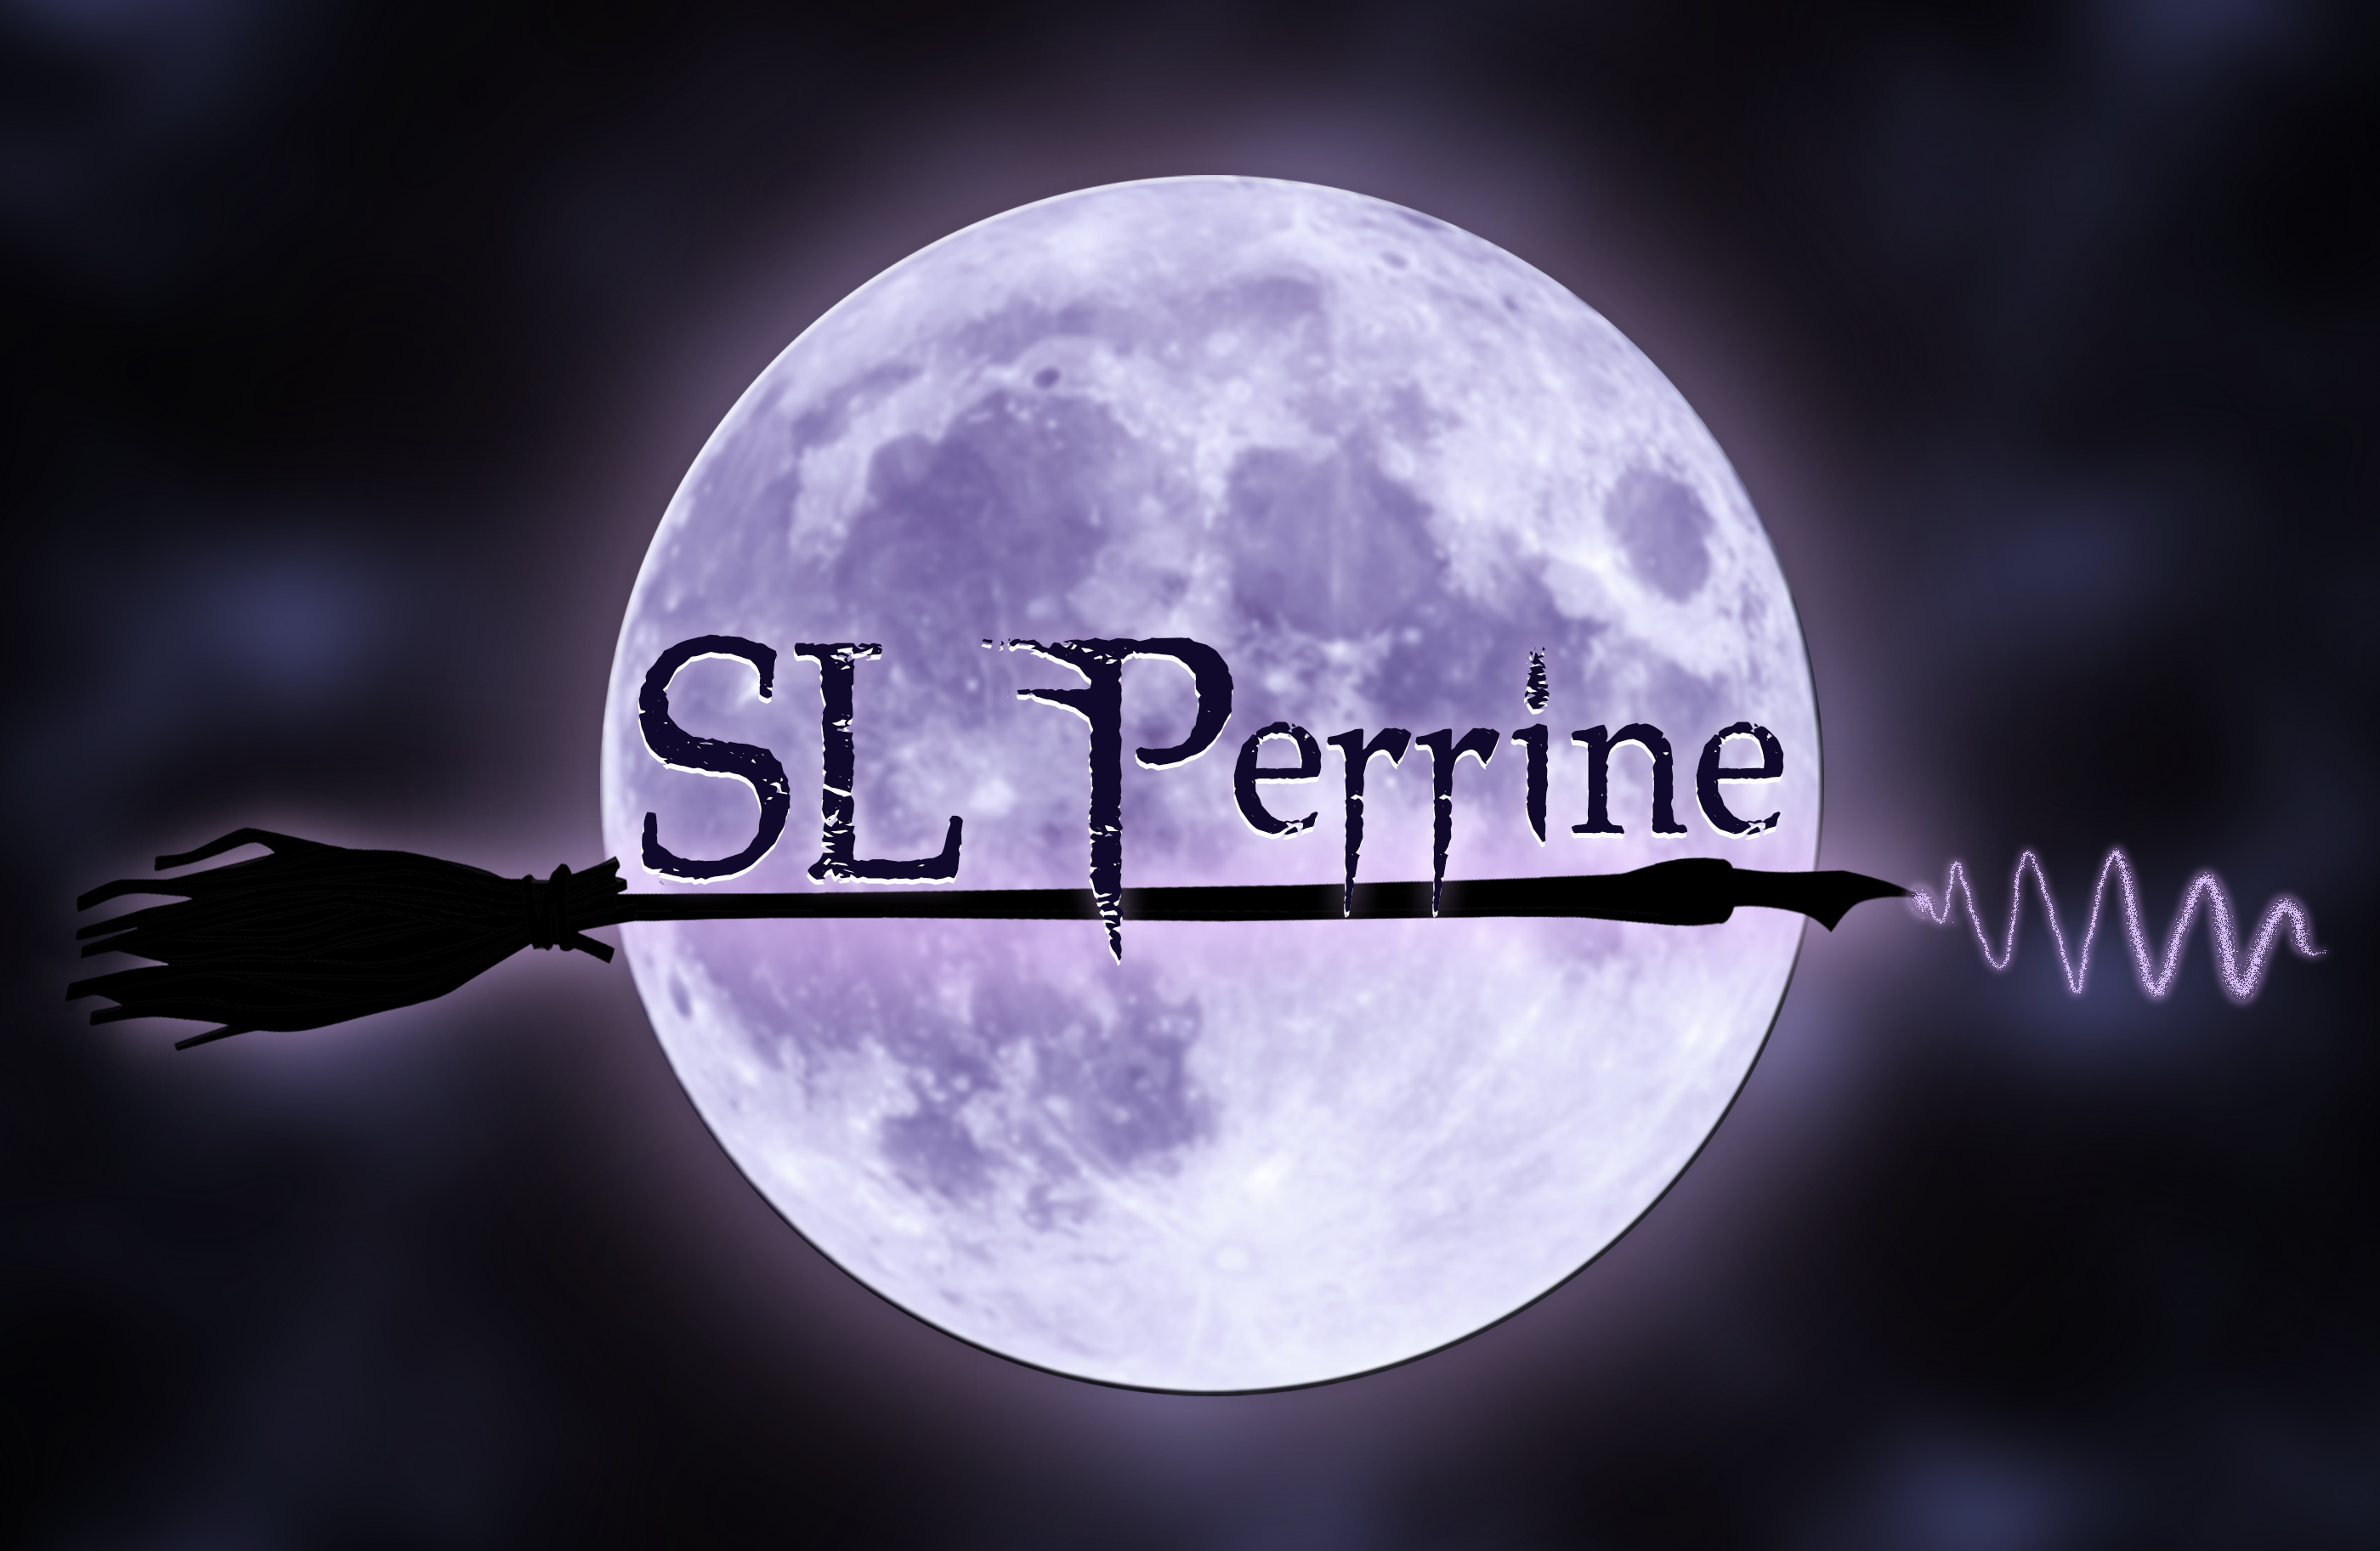 SL Perrine logo